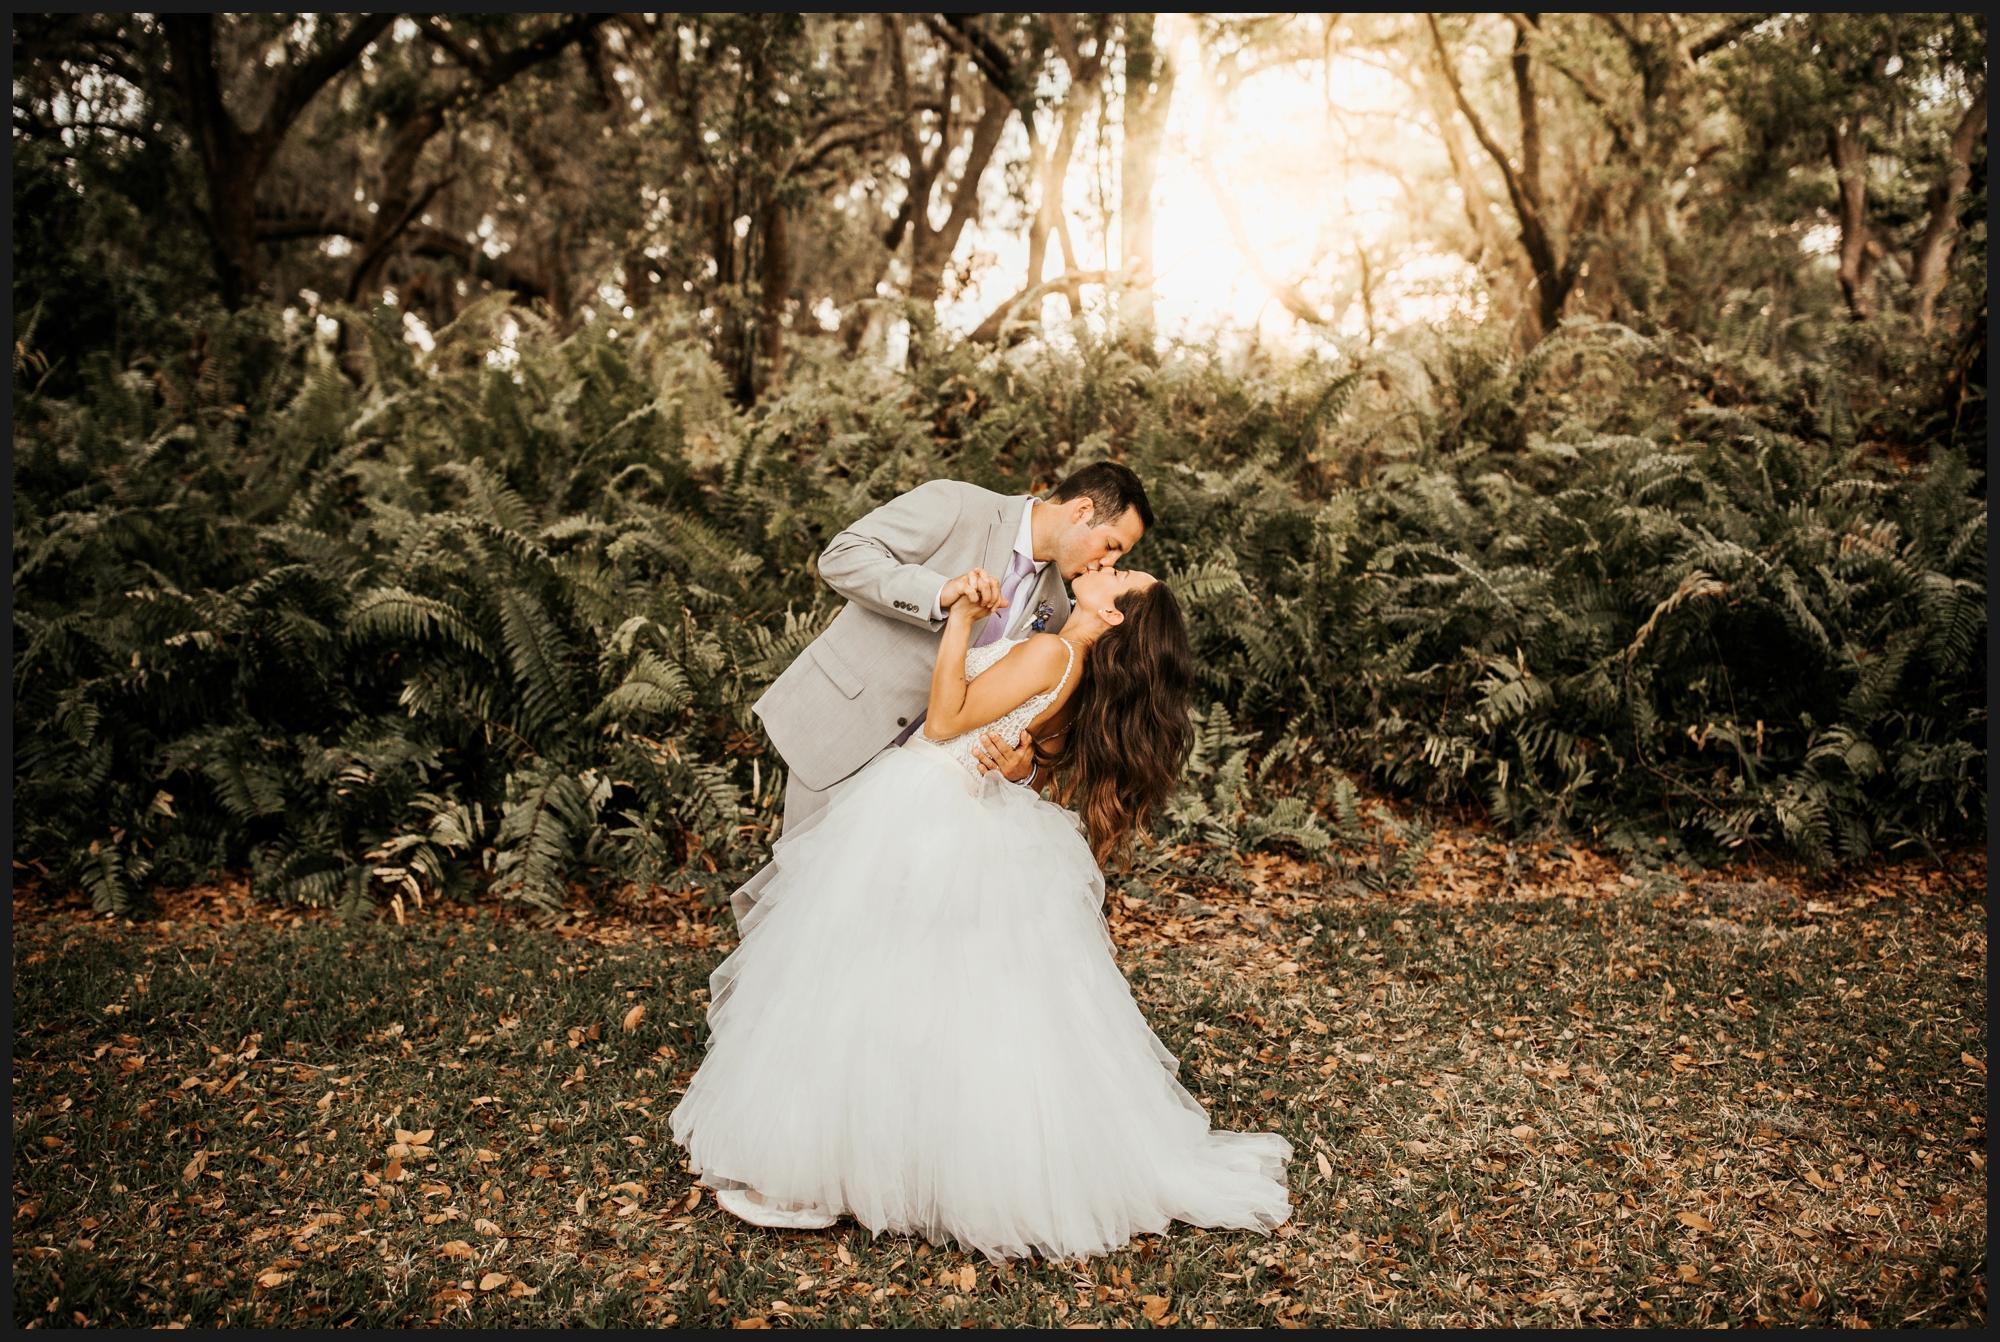 Orlando-Wedding-Photographer-destination-wedding-photographer-florida-wedding-photographer-bohemian-wedding-photographer_1643.jpg